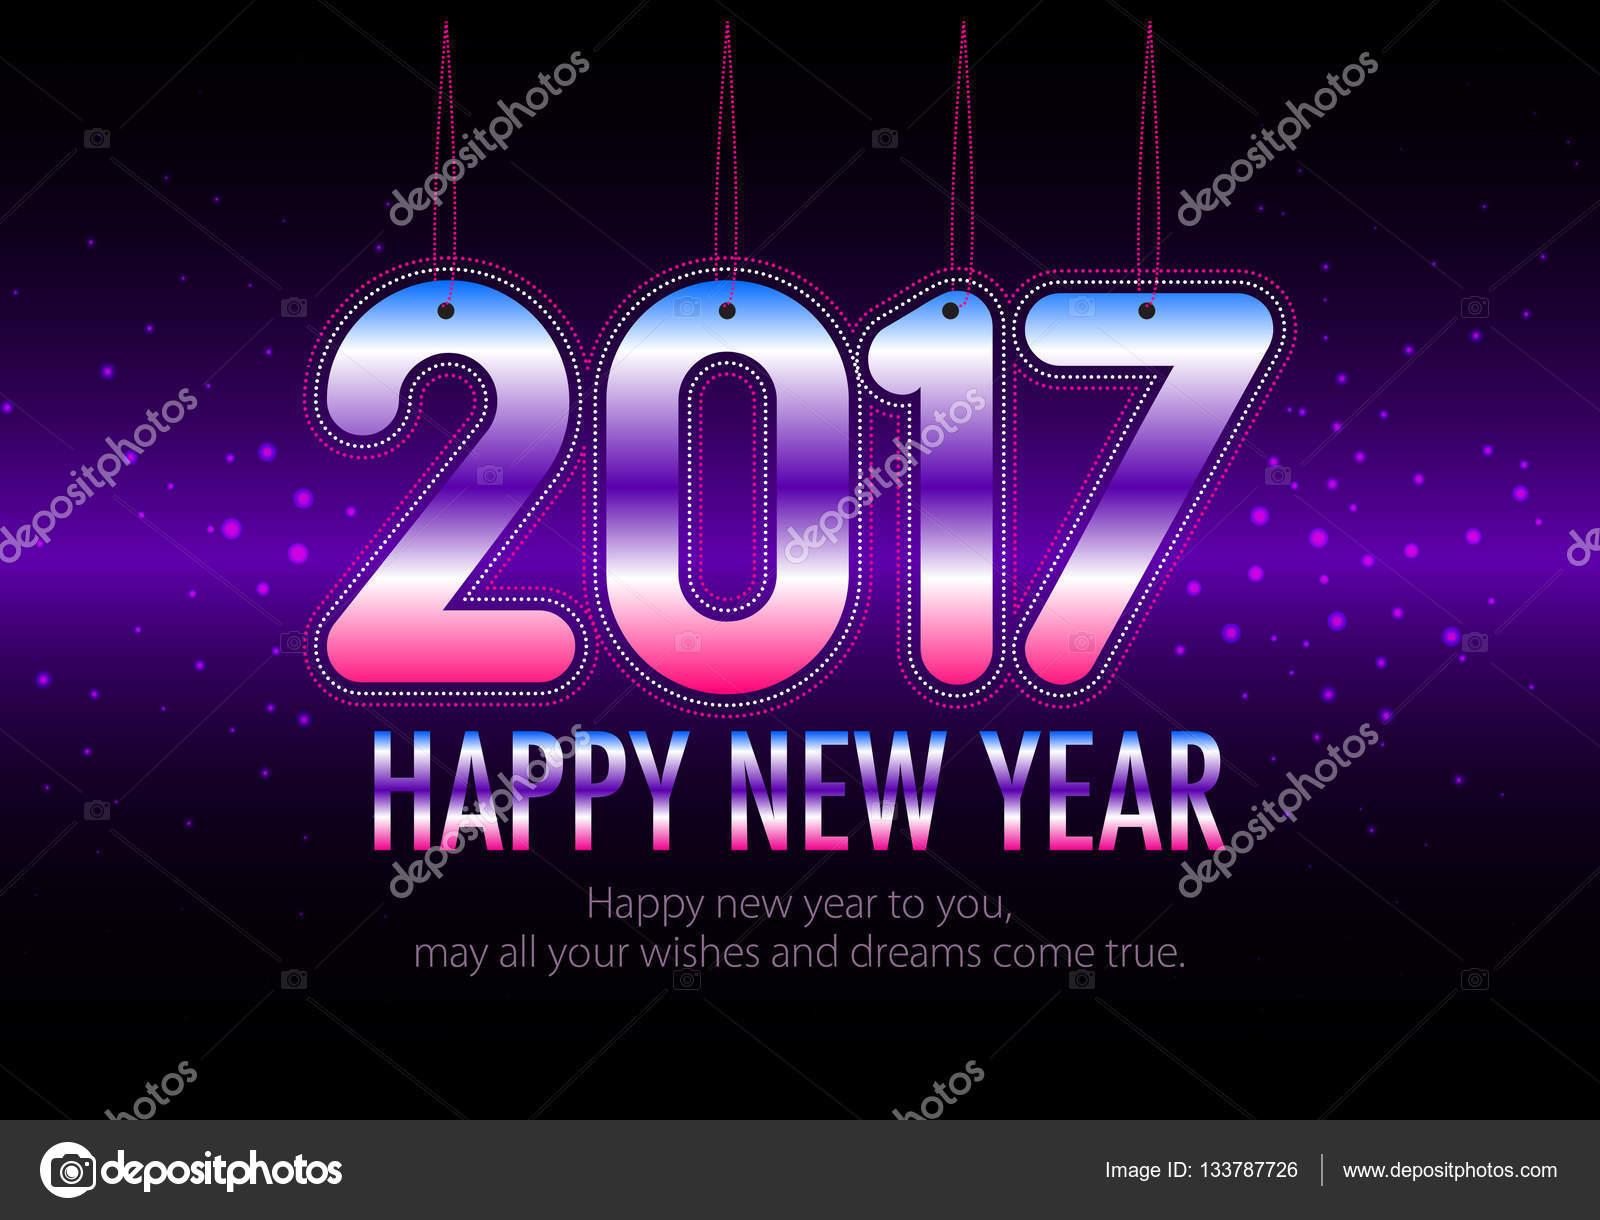 Happy New Year 2017 Bunte Hintergrundbilder Stockvektor